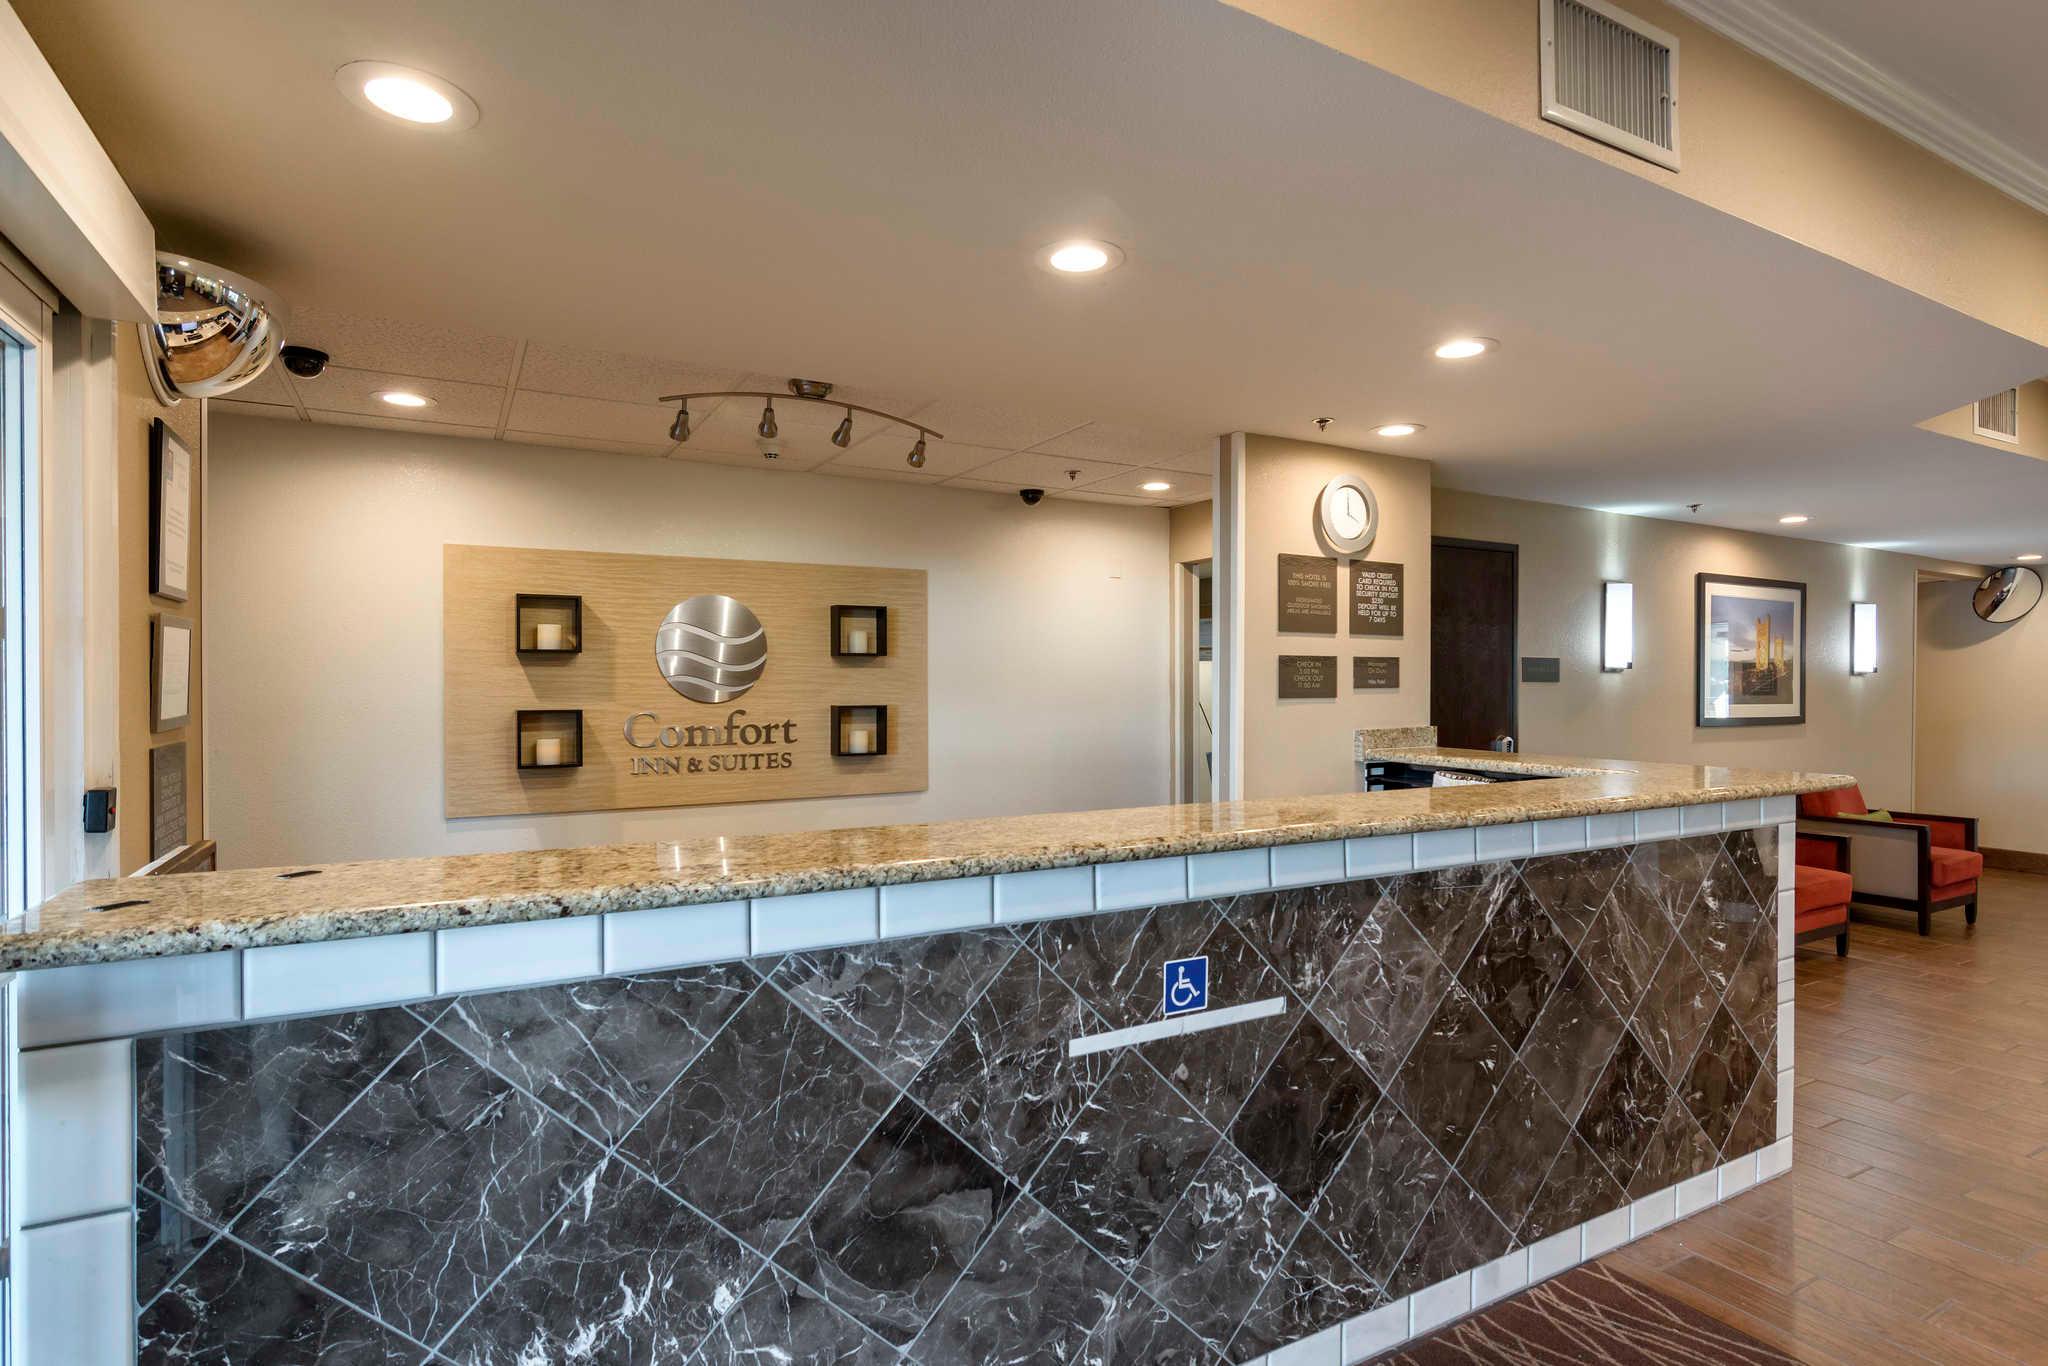 Comfort Inn & Suites Sacramento - University Area image 6